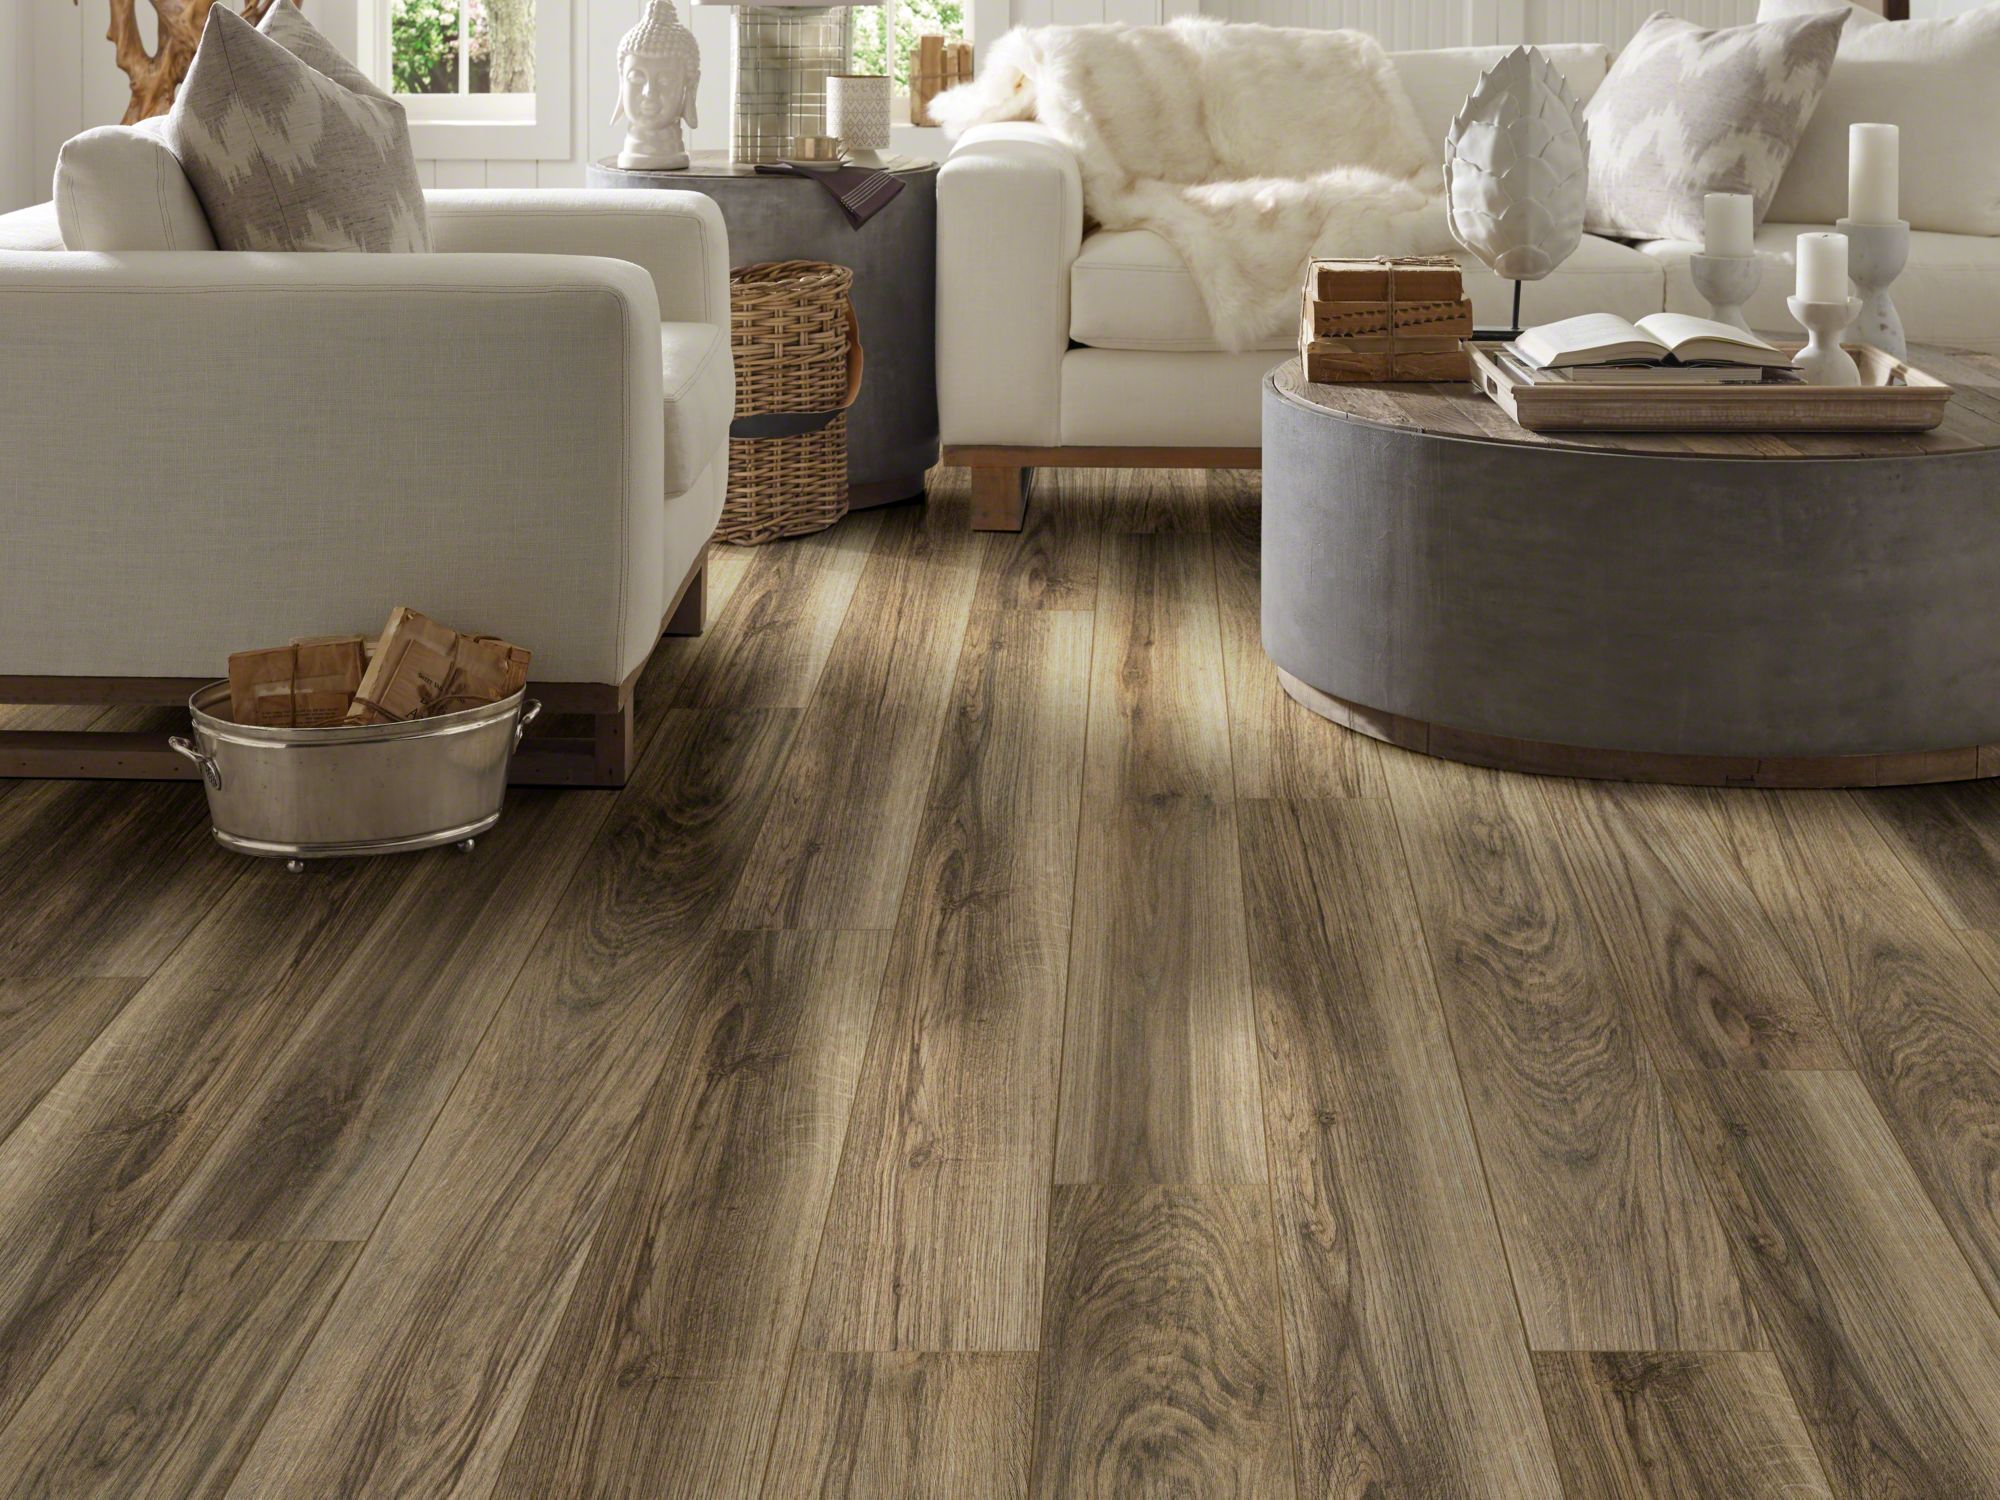 Essentialness of floor installations